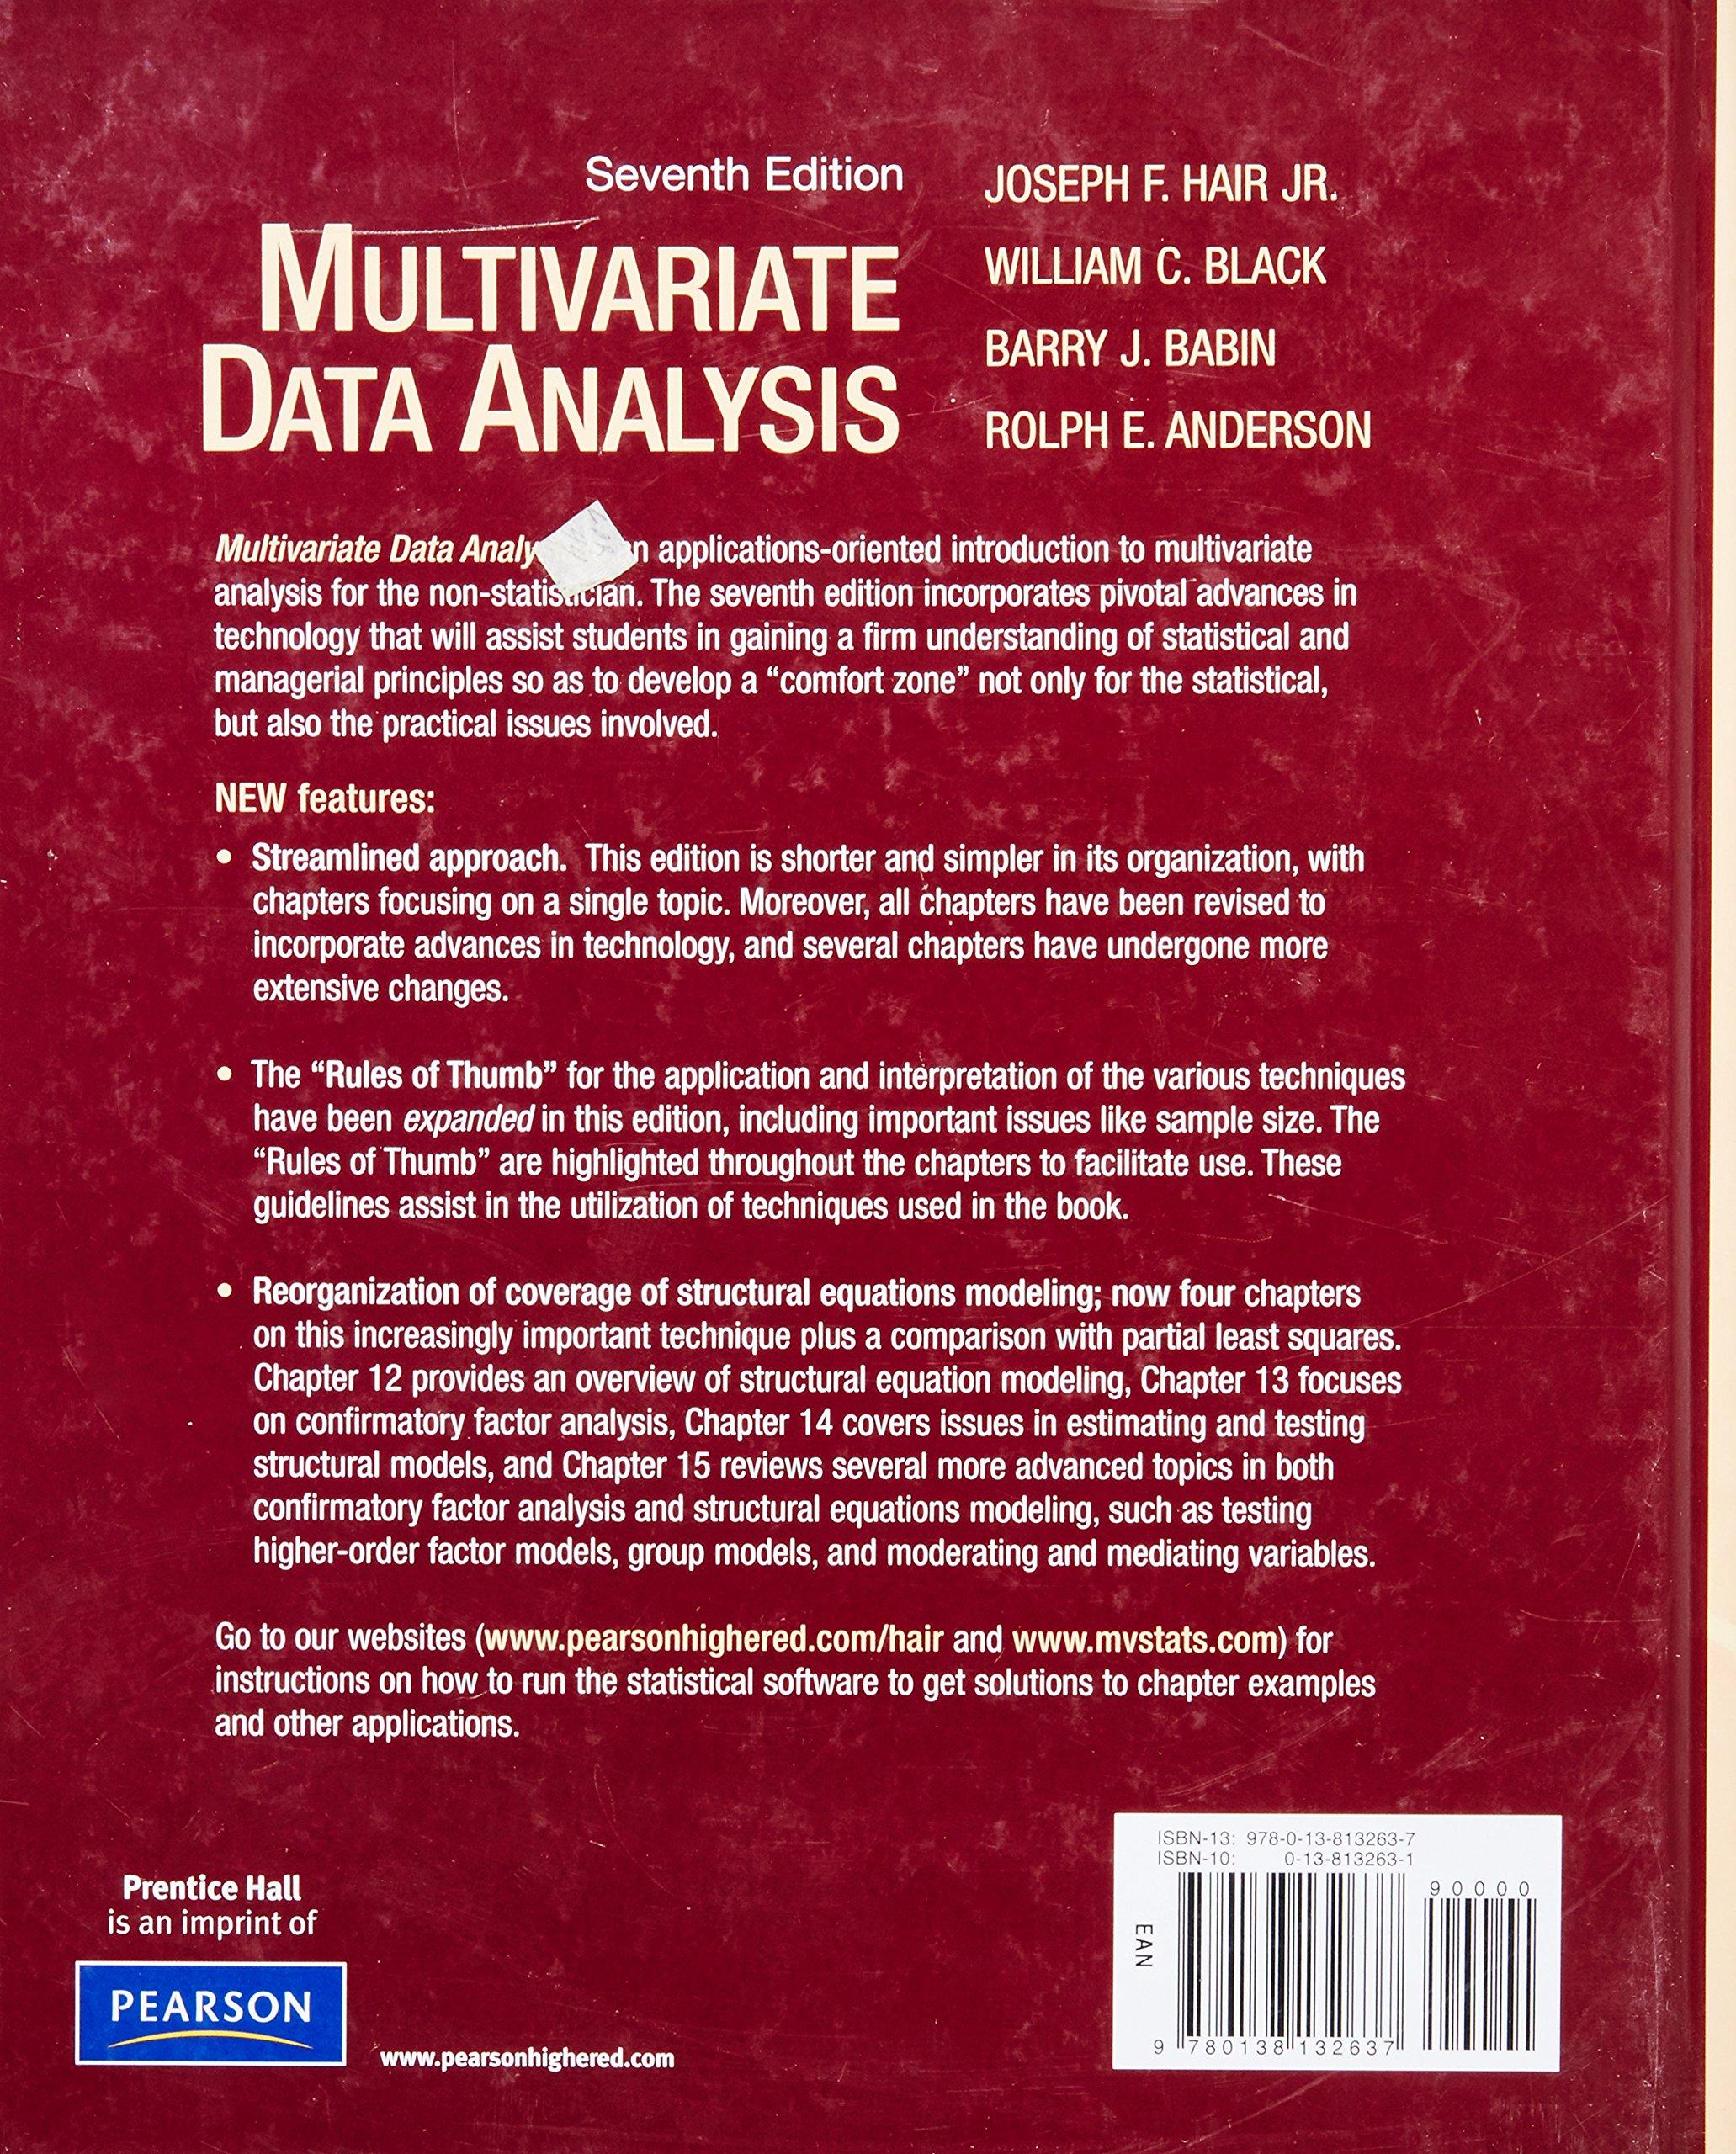 multivariate data analysis amazon co uk joseph f hair jr william